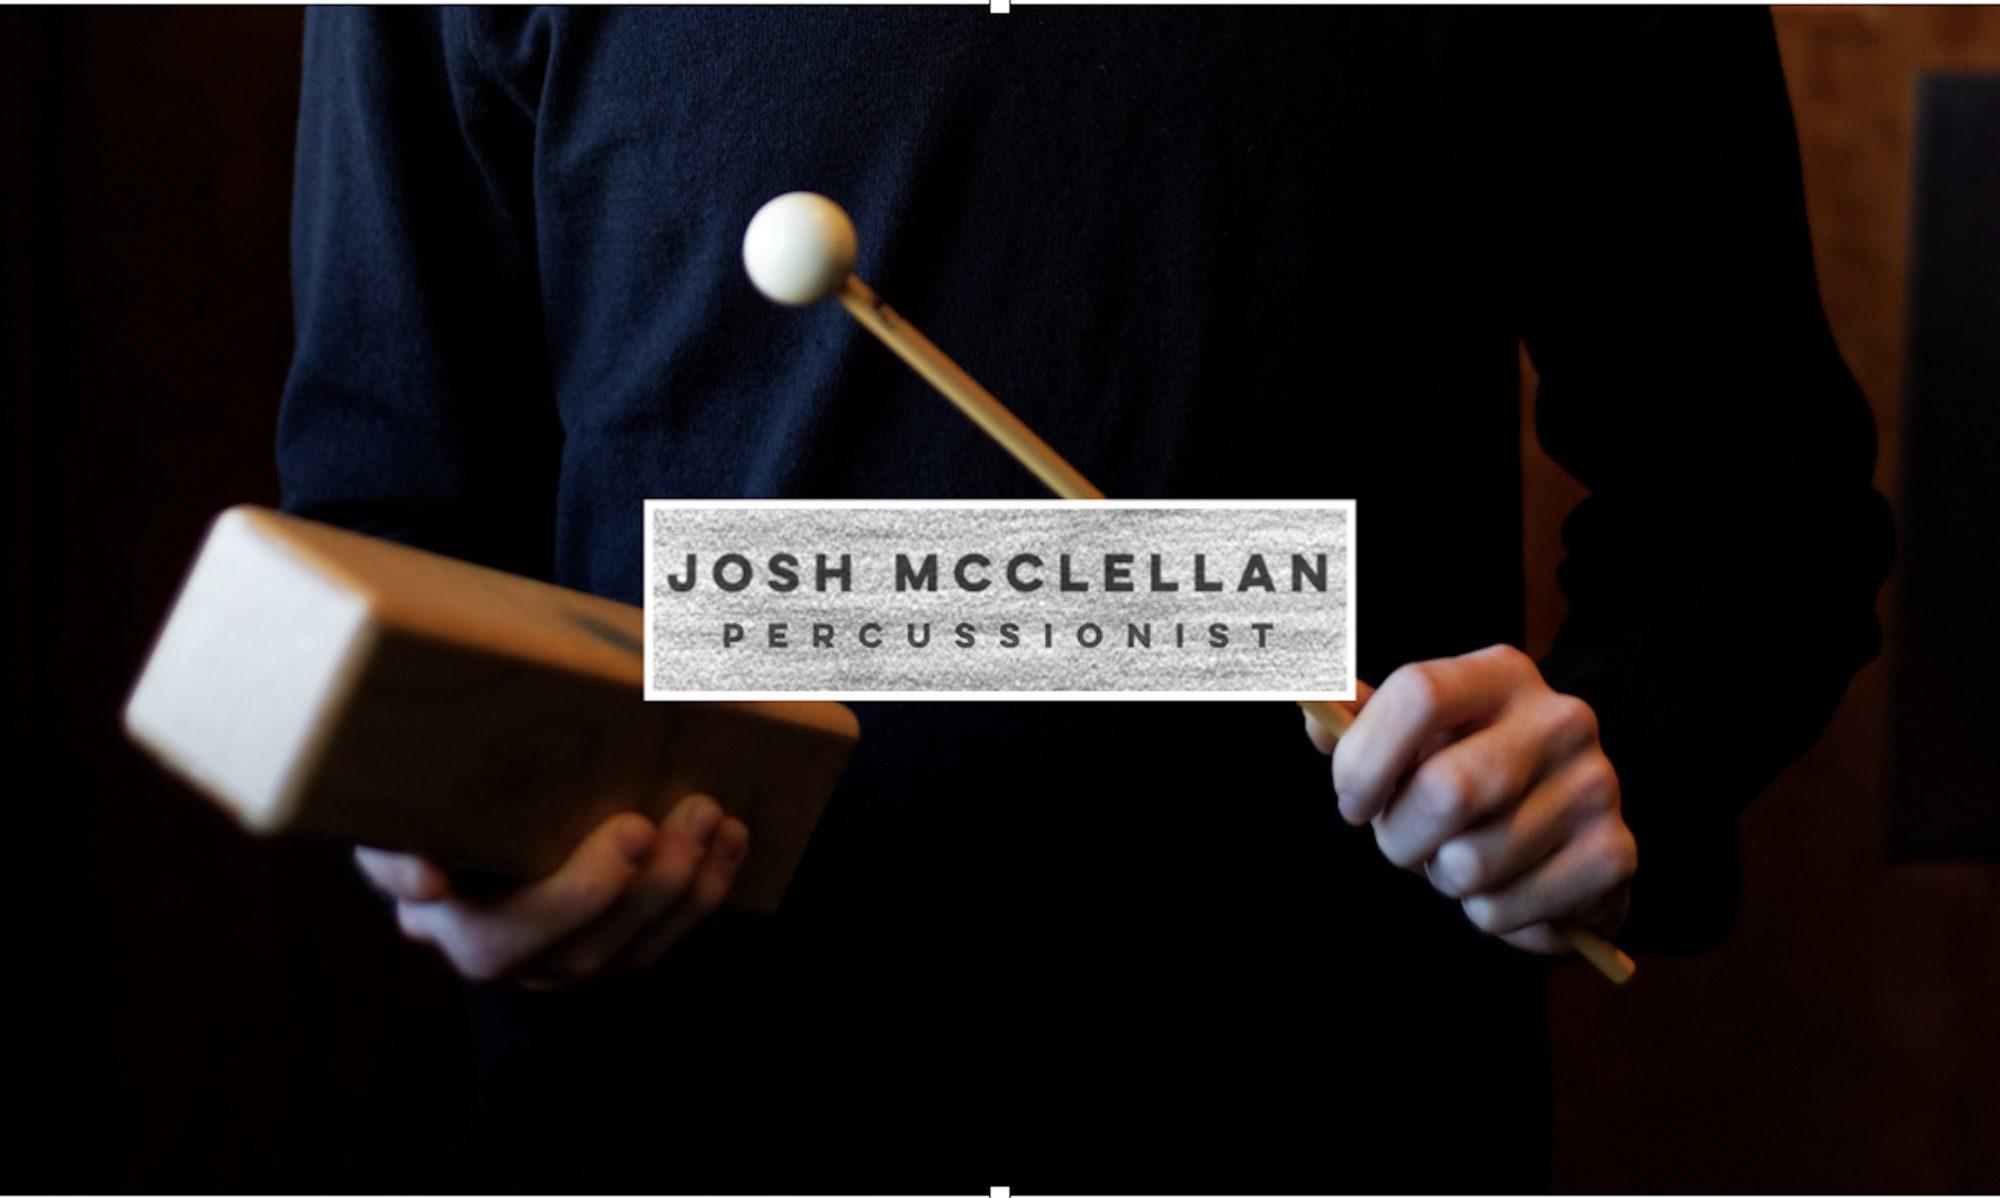 JOSH MCCLELLAN